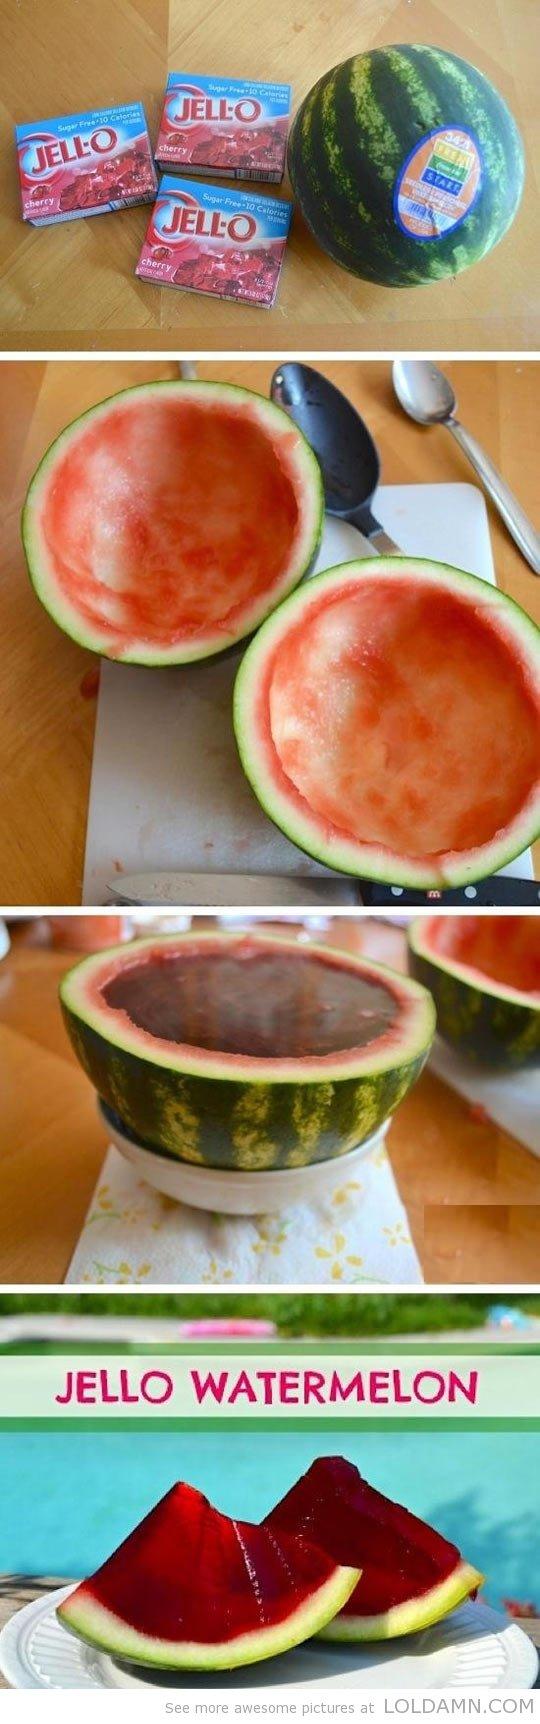 Jello Watermelon. . lta. Why did you get CHERRY?!?1 WHY NOT WATERMELON jelly watermelon delicious